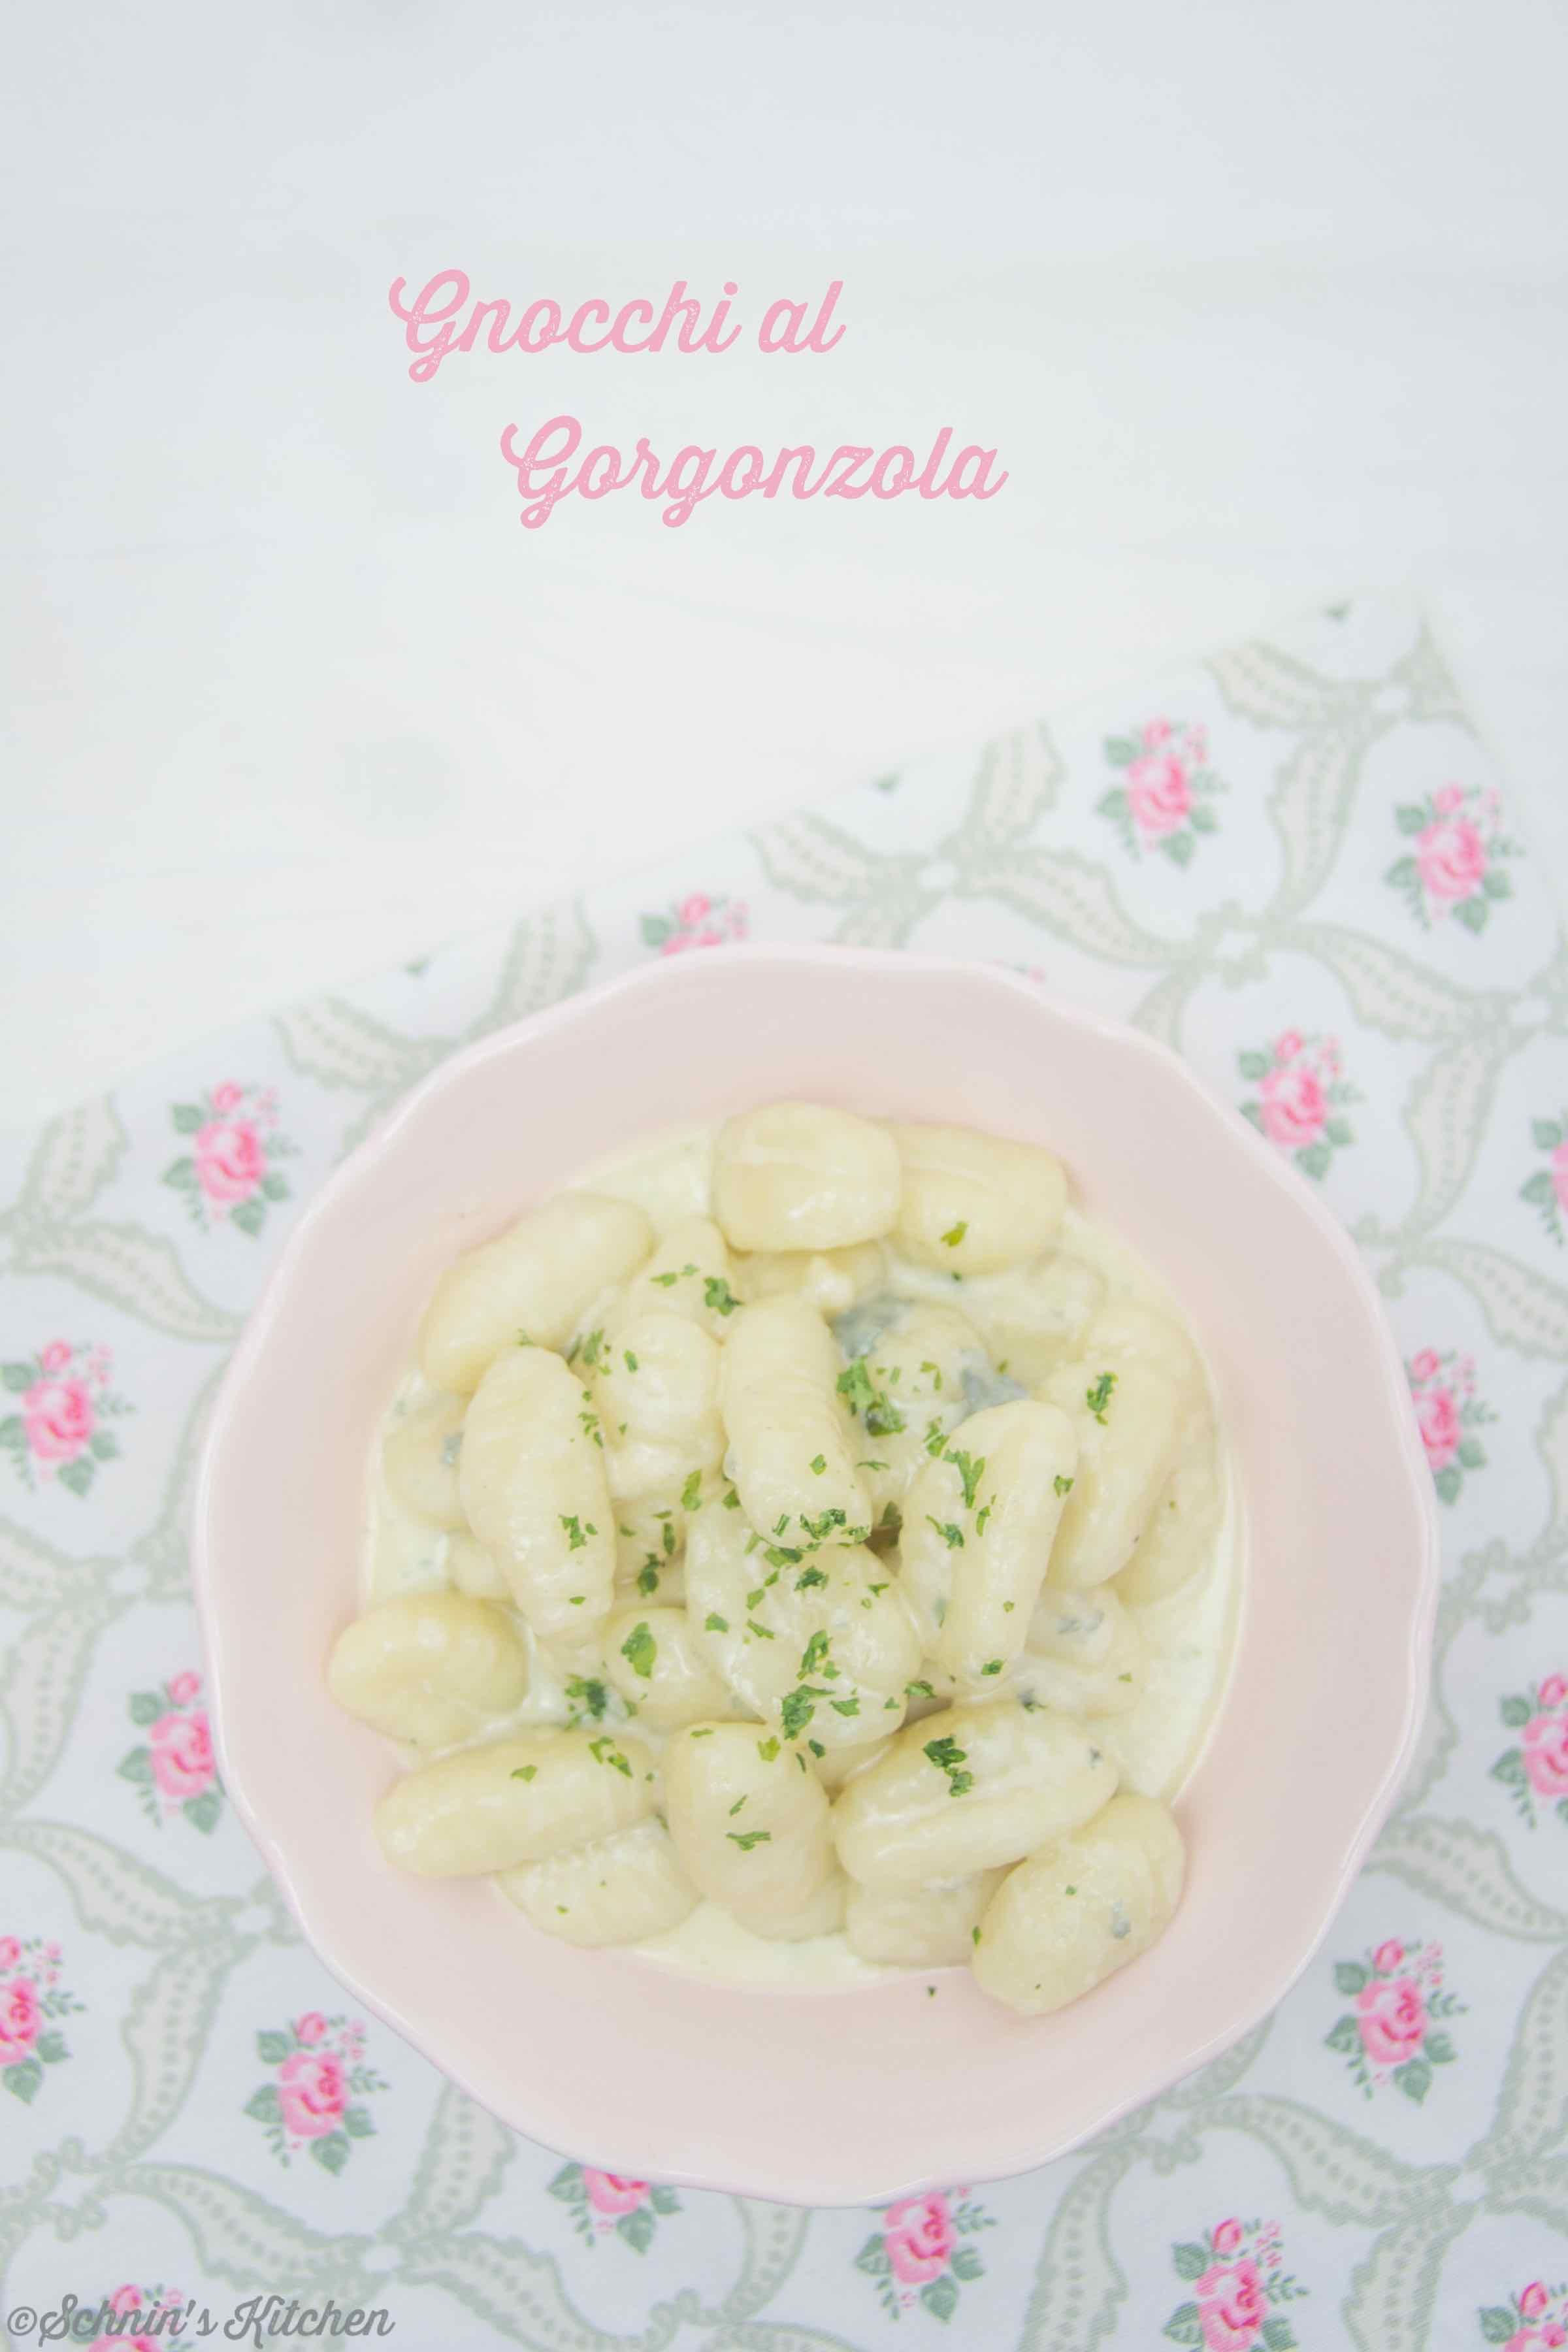 Schnin's Kitchen: Gnocchi al Gorgonzola